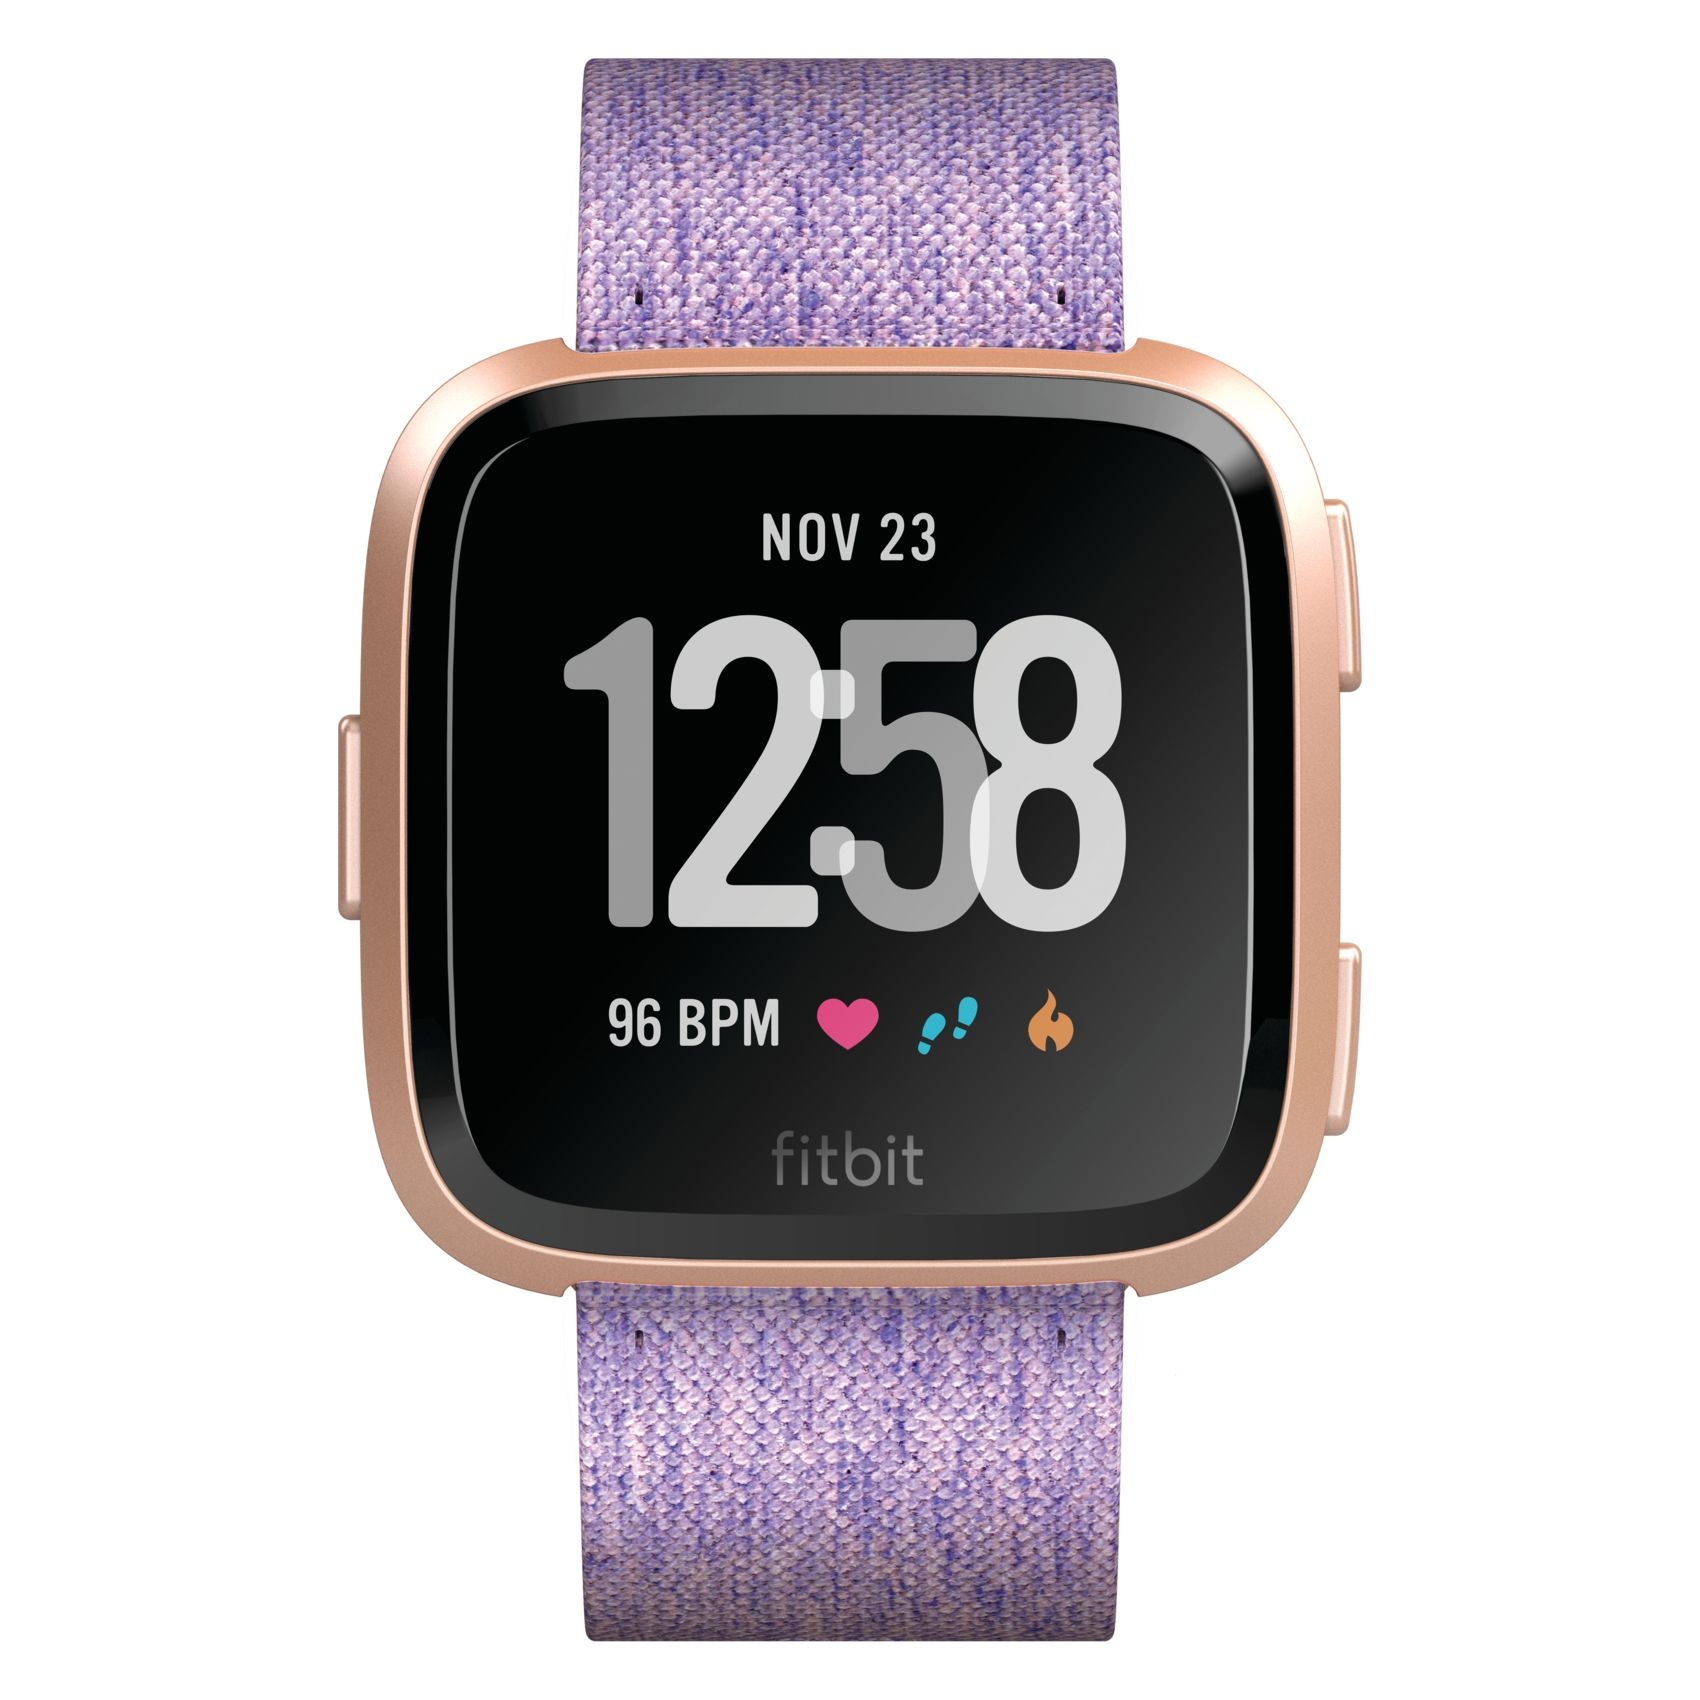 Smartwatch Fitbit Versa (NFC) - Lavender Woven